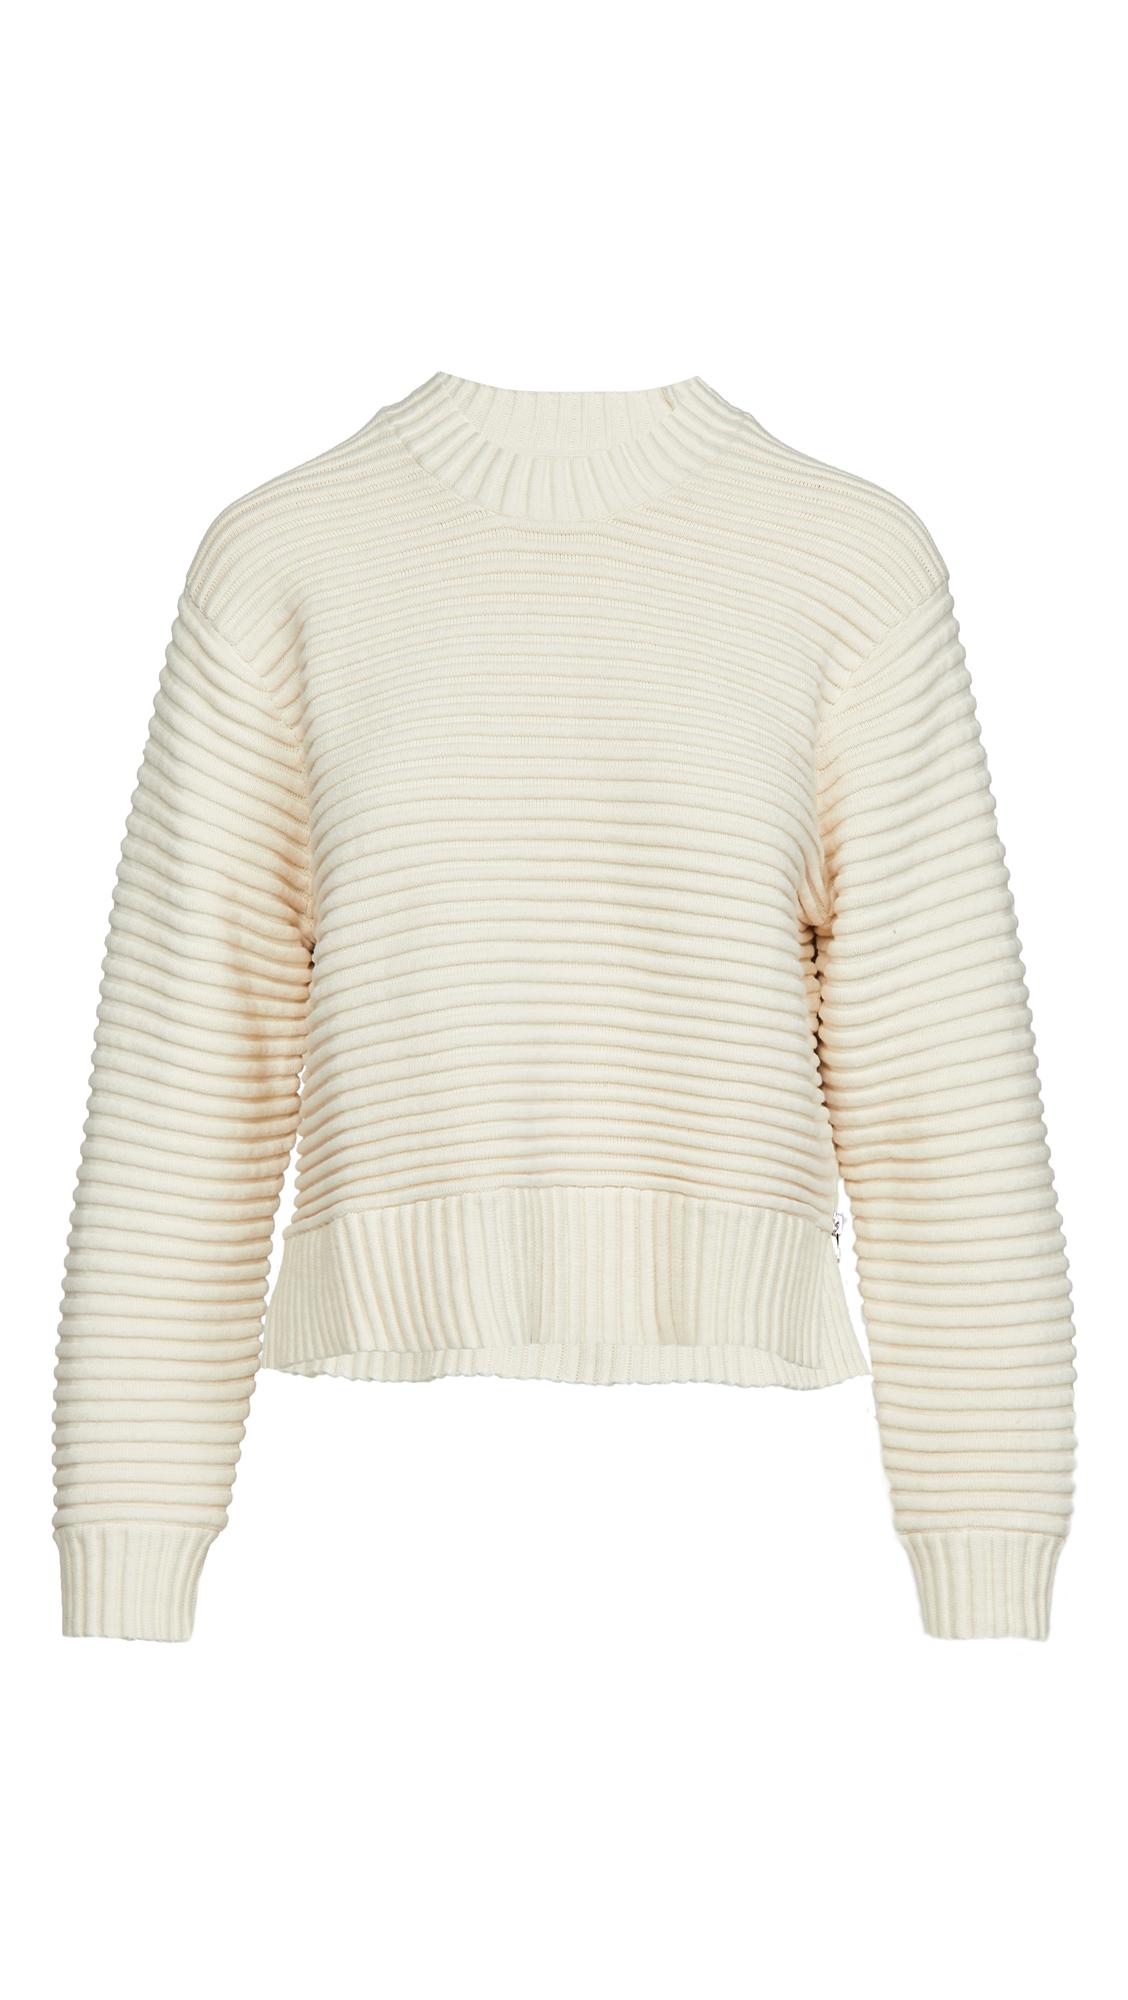 Varley Talbert Sweater